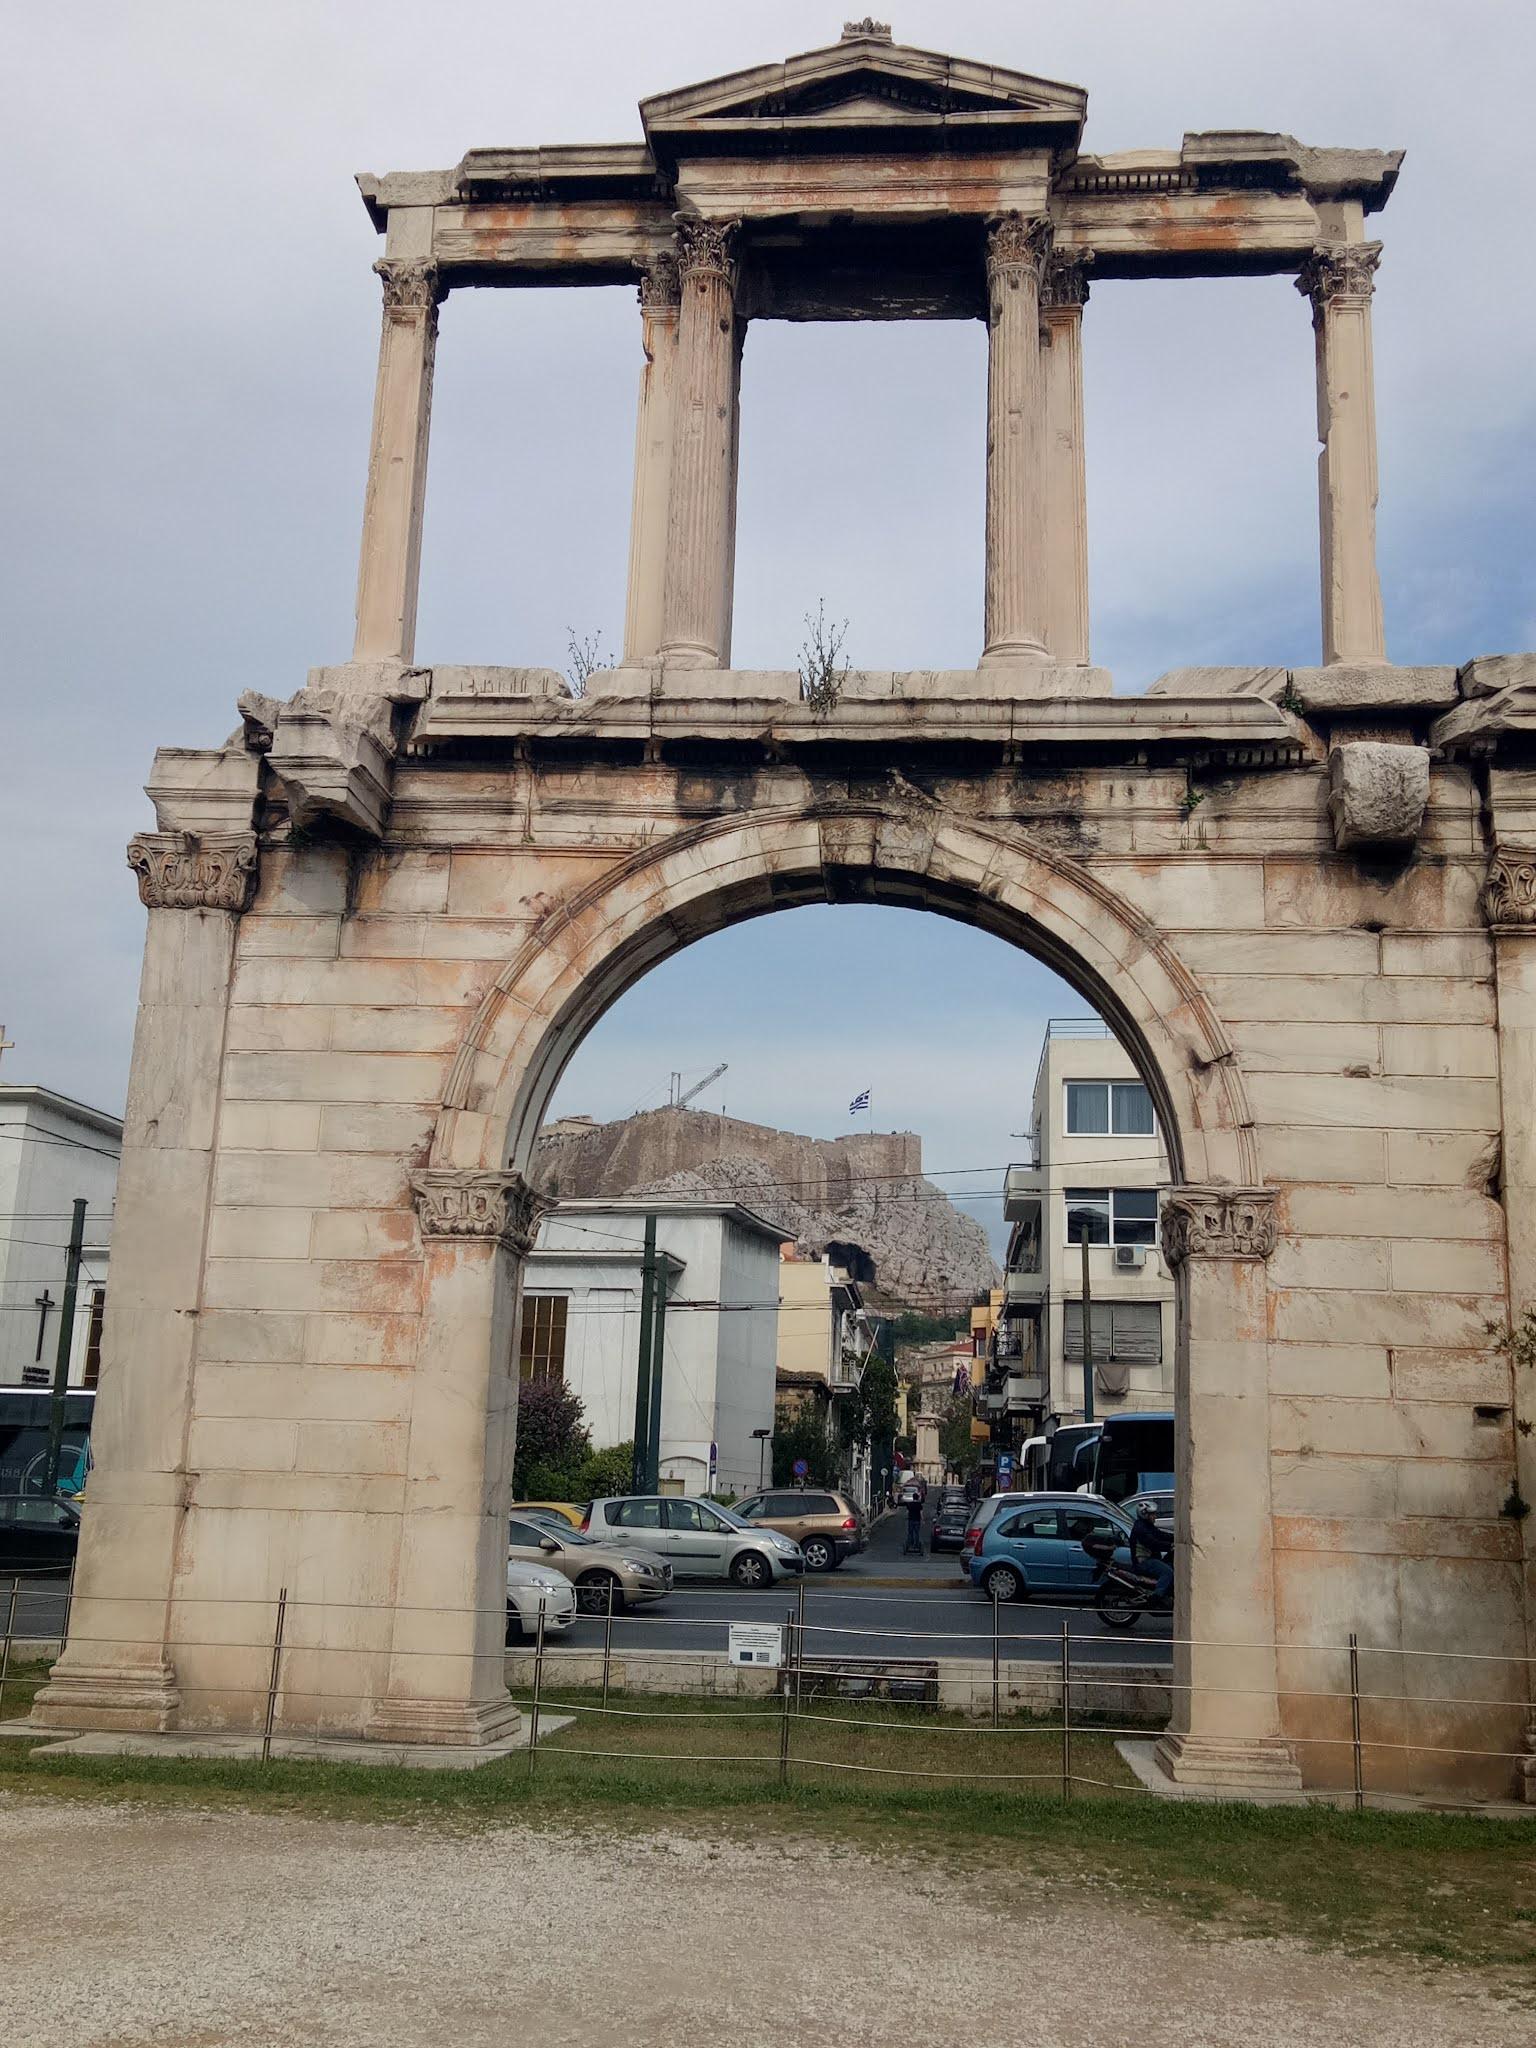 Travelog Greece, Athens: Hadrian's Arch